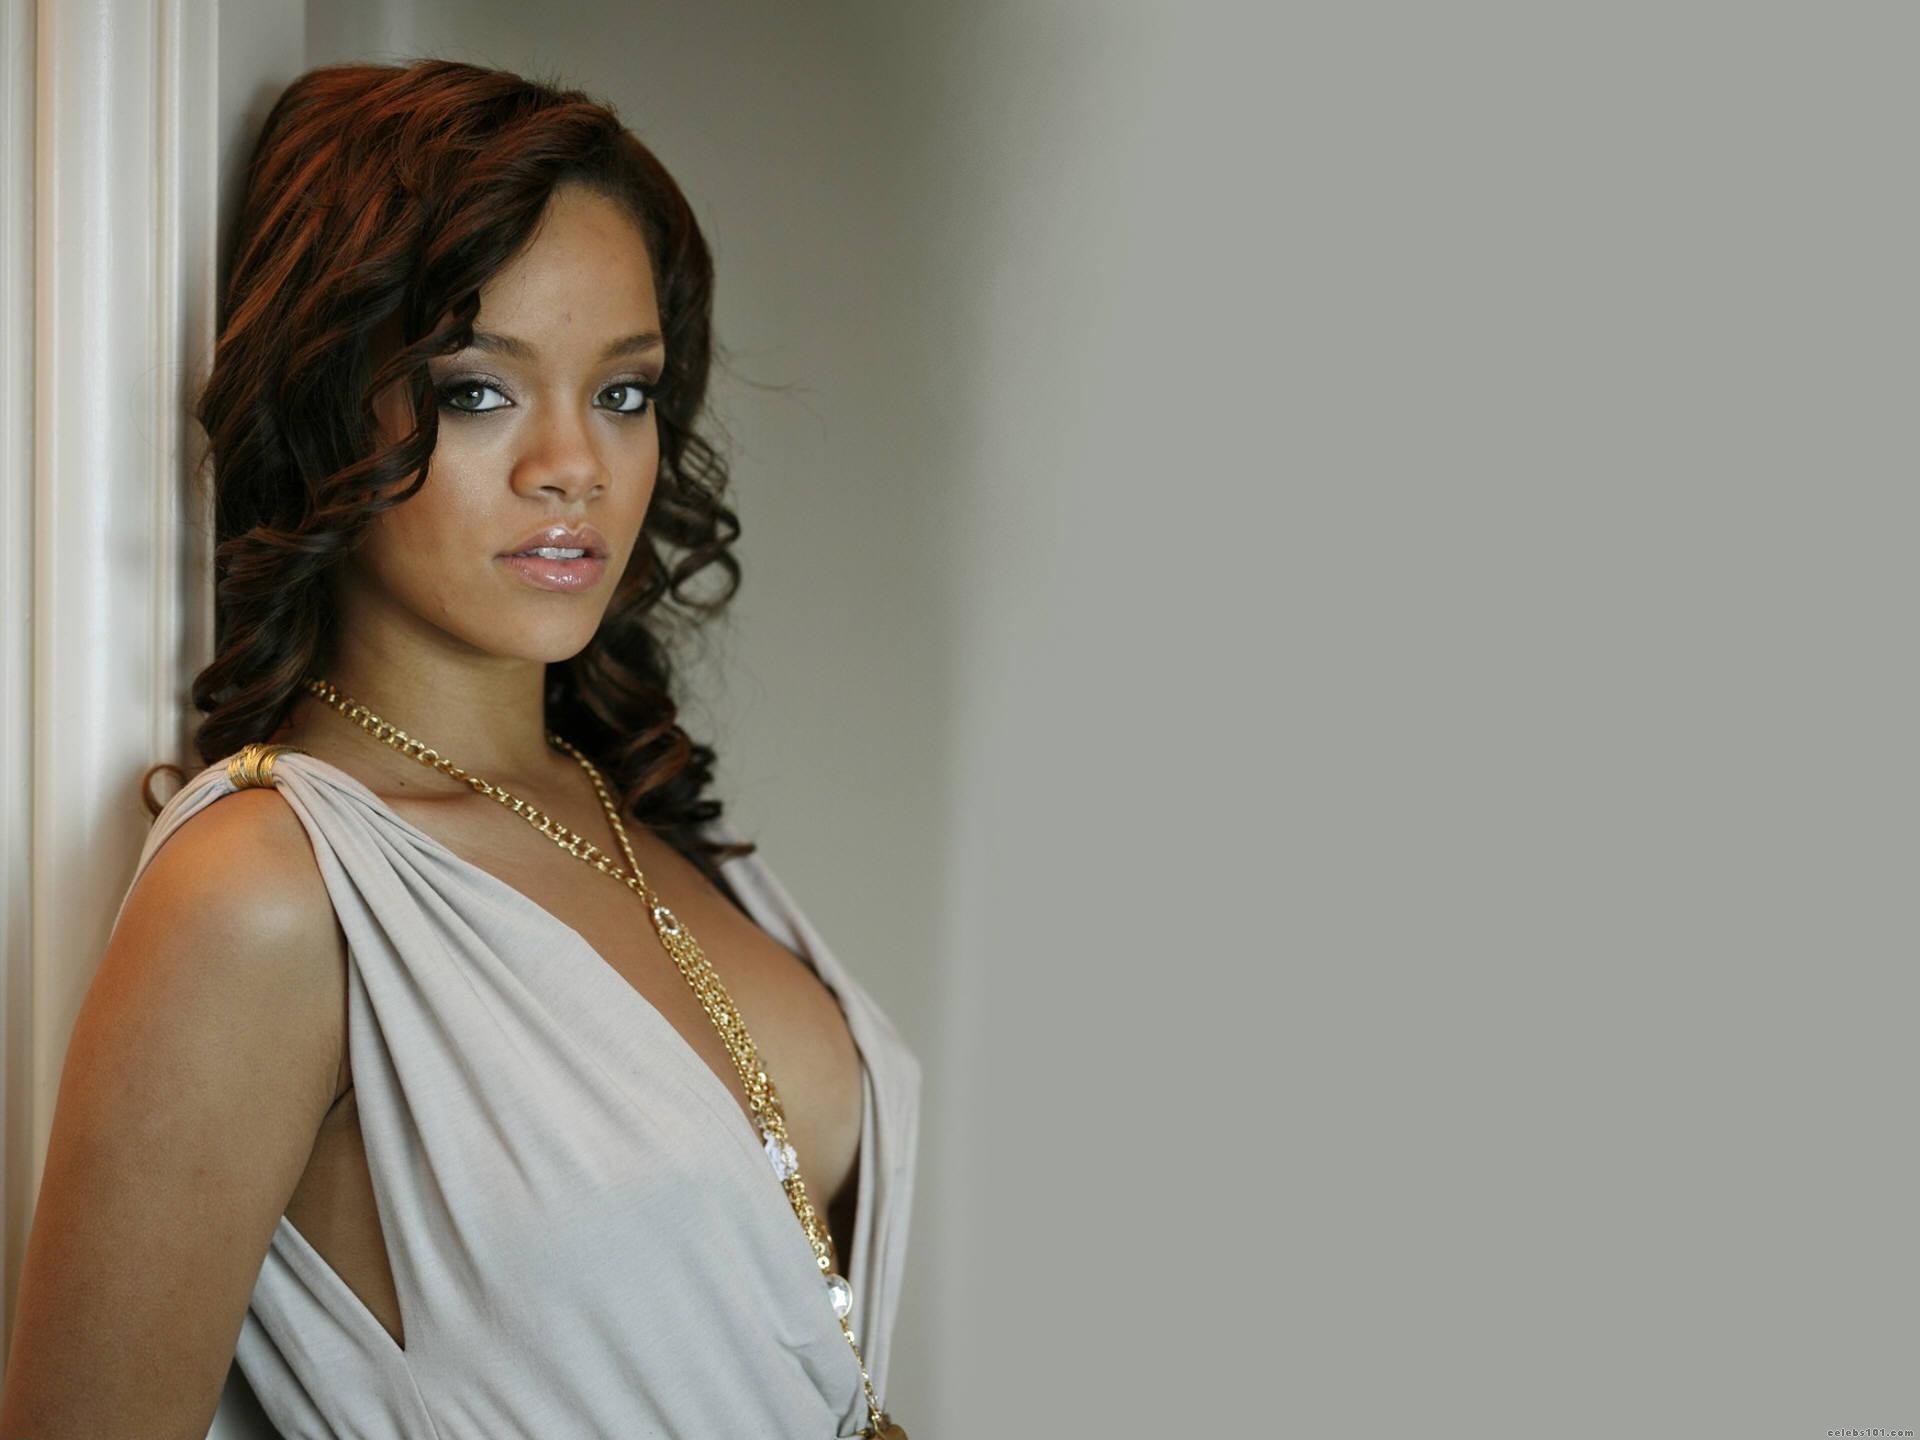 Drake Wallpaper Quotes Rihanna Wallpaper 183 ① Download Free Awesome Hd Wallpapers